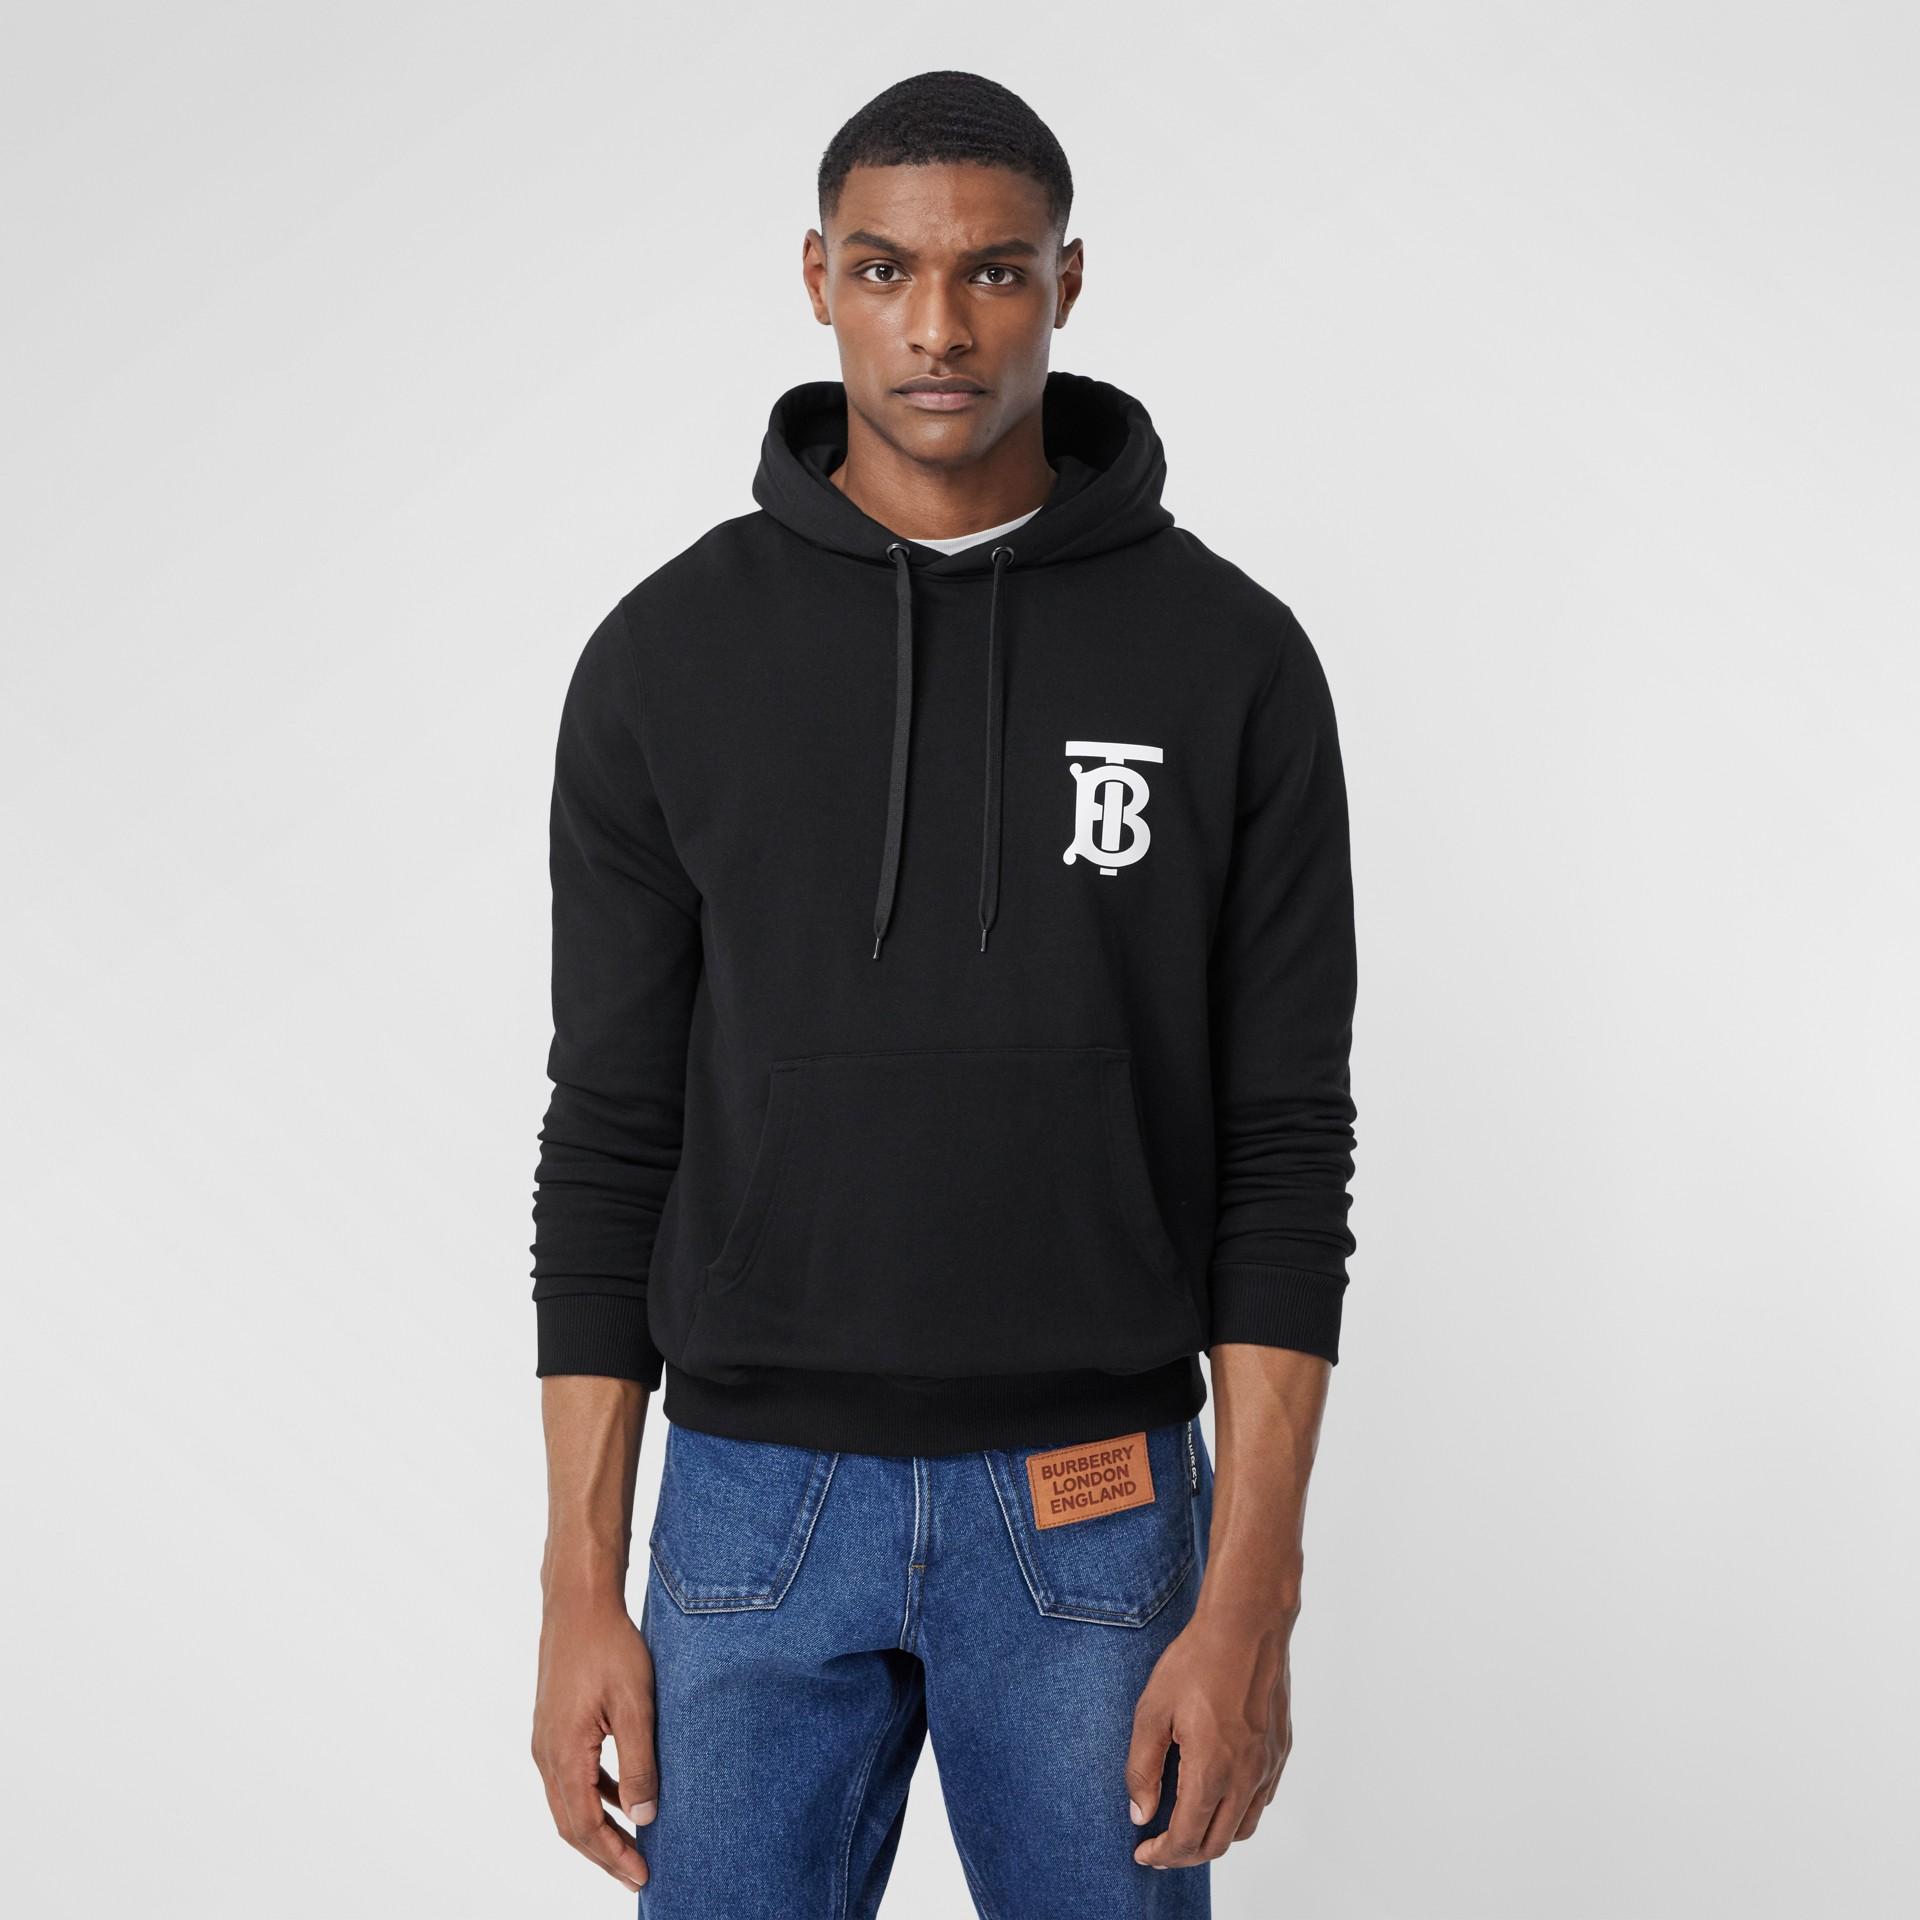 Monogram Motif Cotton Hoodie in Black - Men | Burberry - gallery image 4